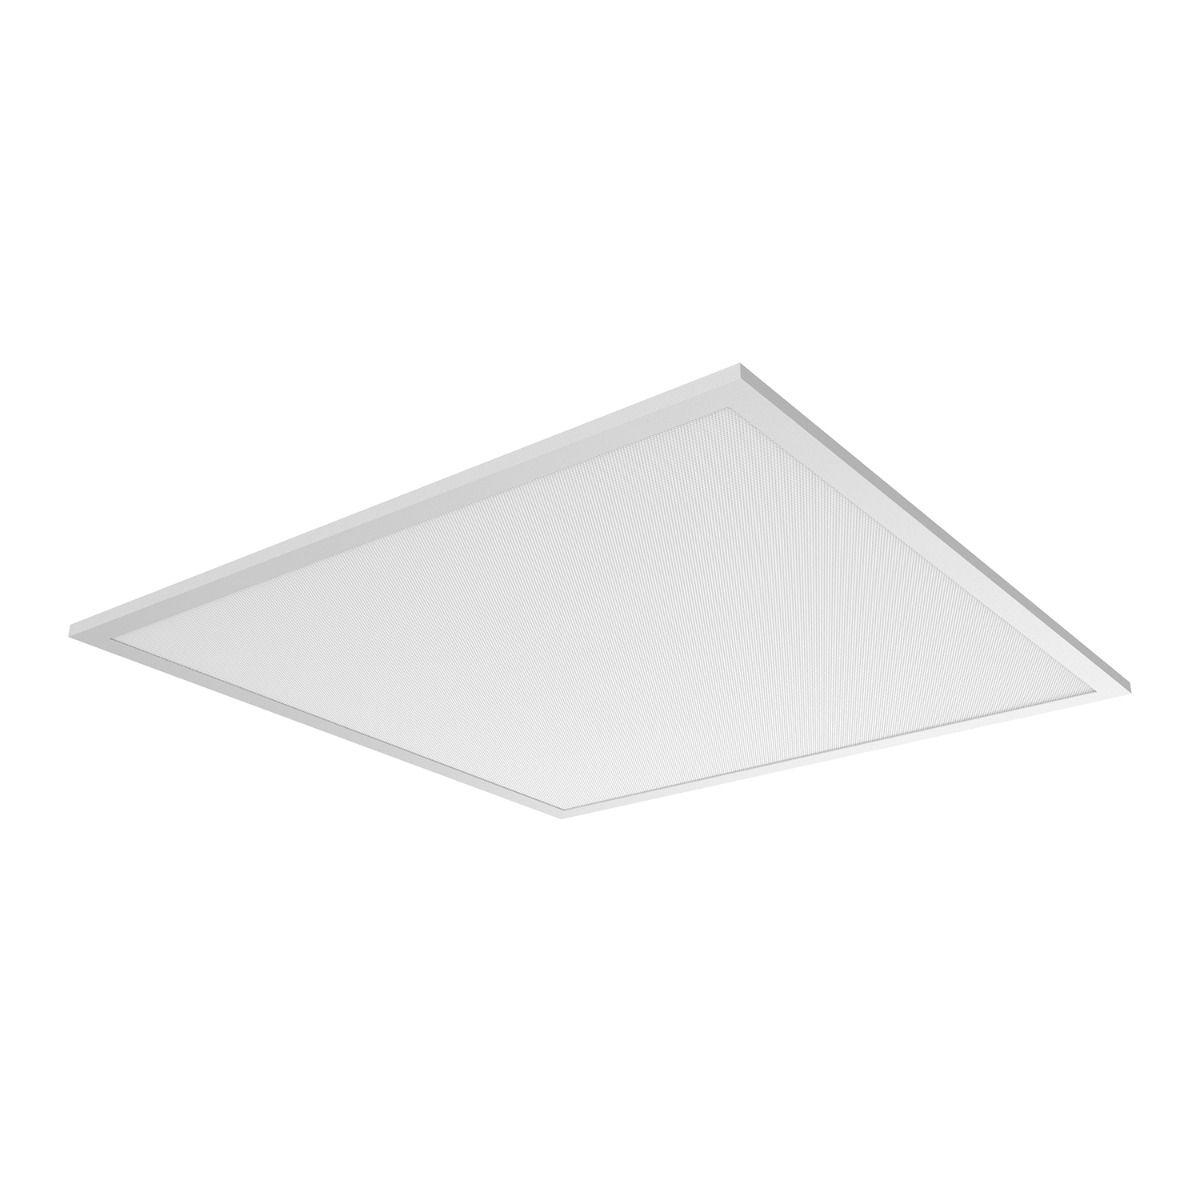 Noxion LED Panel Delta Pro V3 Highlum DALI 36W 3000K 5225lm 60x60cm UGR <19 | Warmweiß - Ersatz für 4x18W